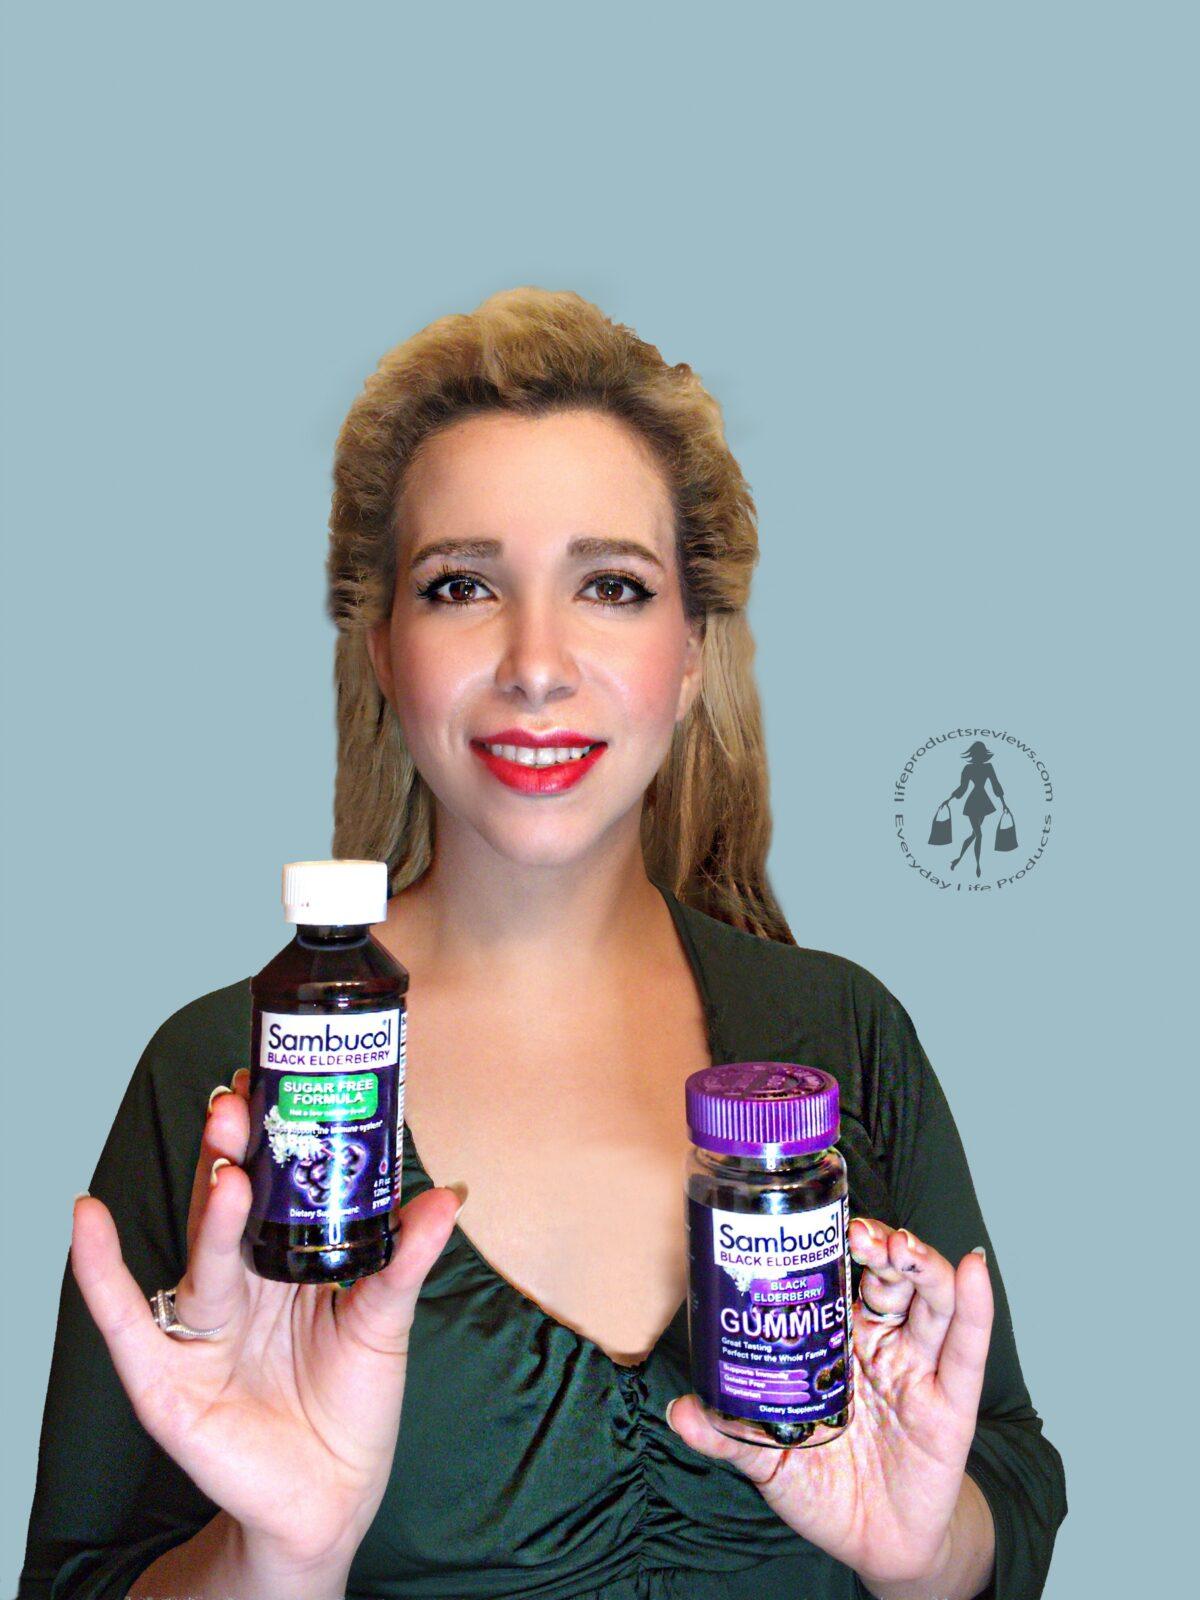 Sambucol-black-elderberry-gummies-sugar-free-syrup-childrens-syrup-yes-better